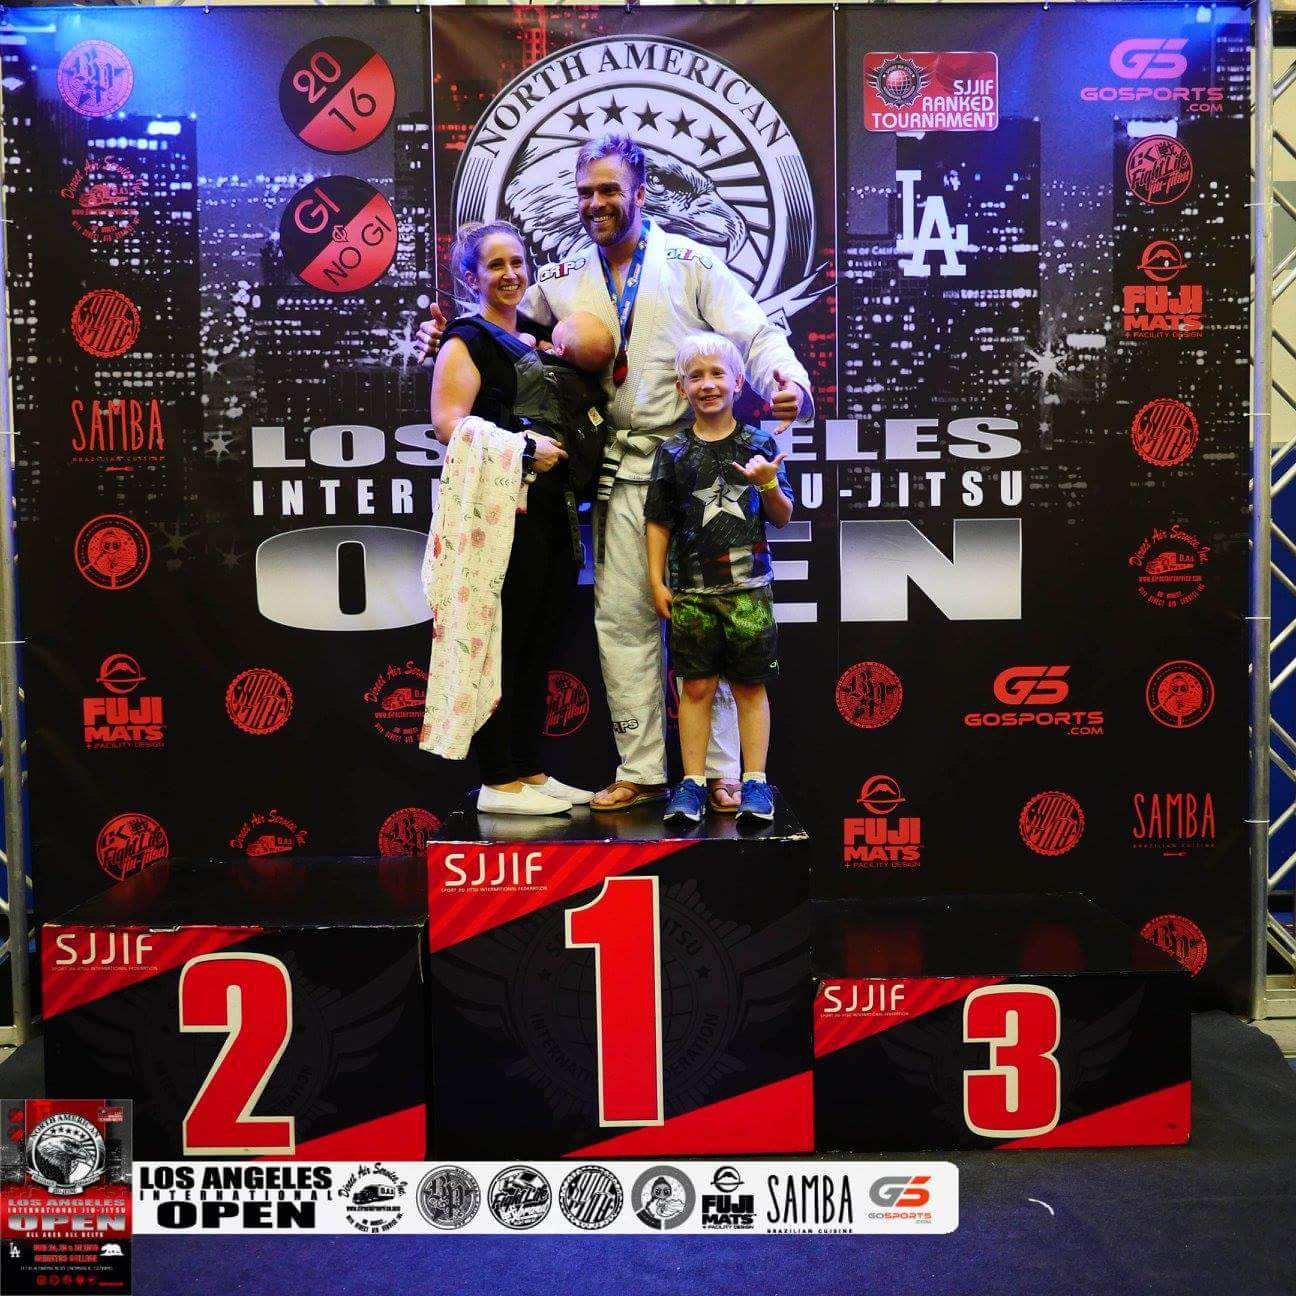 Strong Performance At Los Angeles Open Jiu-Jitsu Tournament